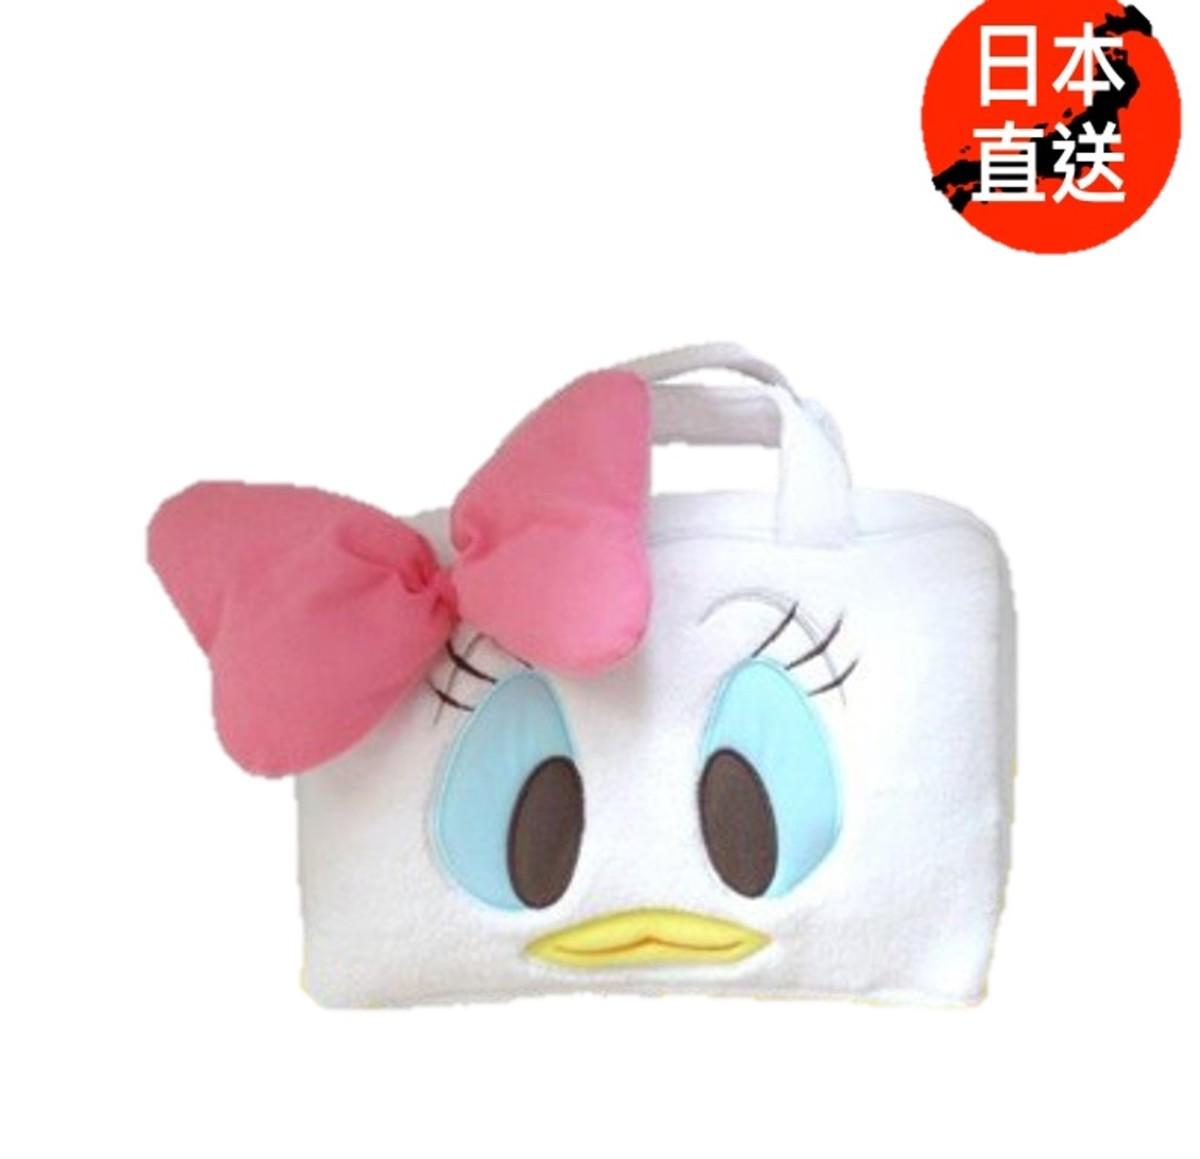 Disney-Daisy Multi-purpose storage bag (Licensed by Disney)